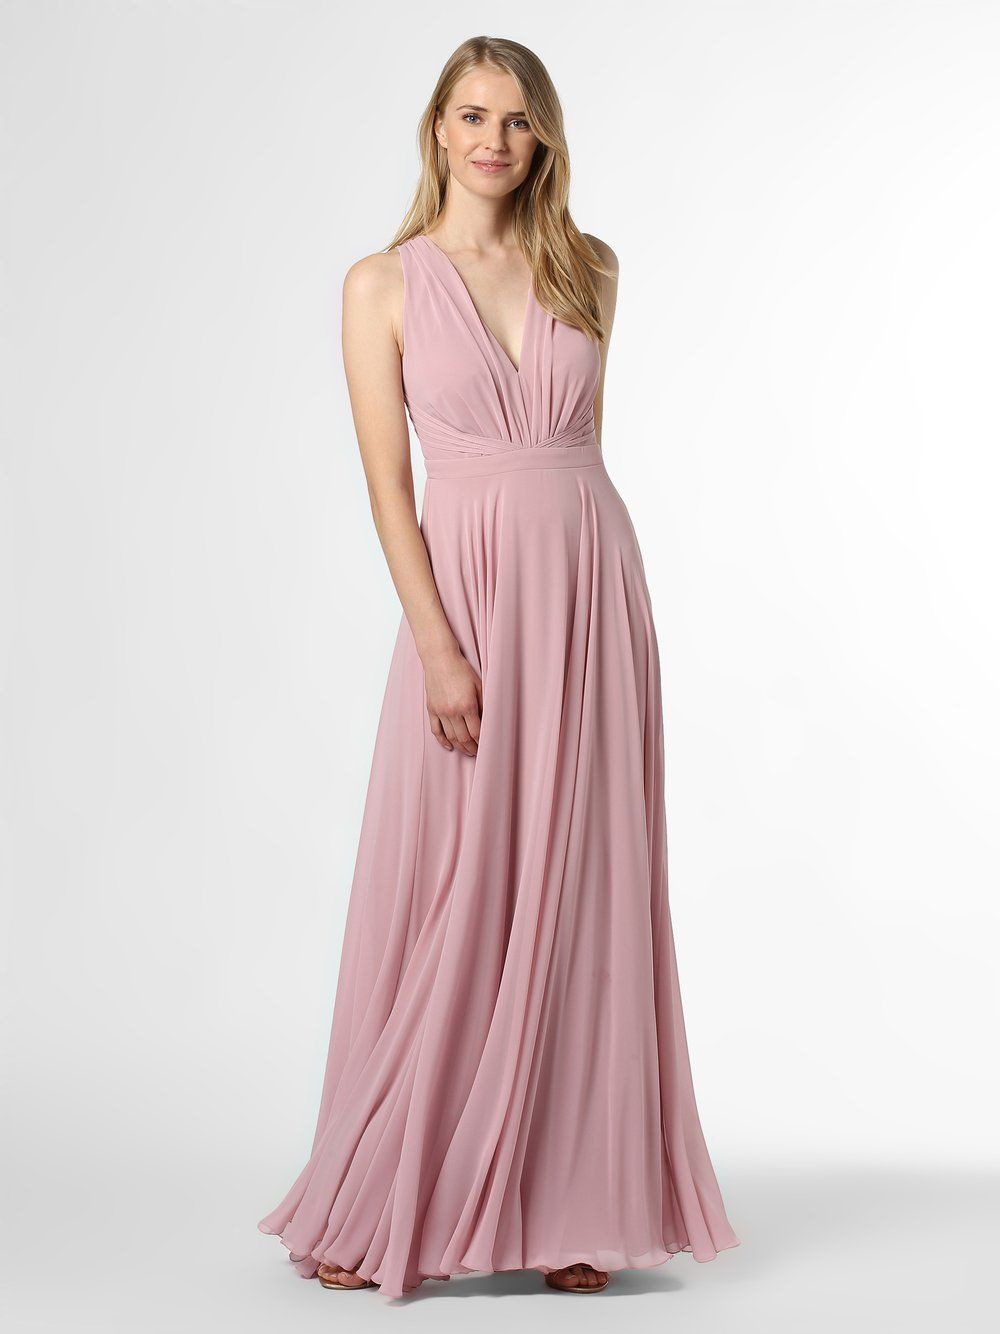 Marie Lund Abendkleid Rosa | Abendkleid, Abendkleid Rosa